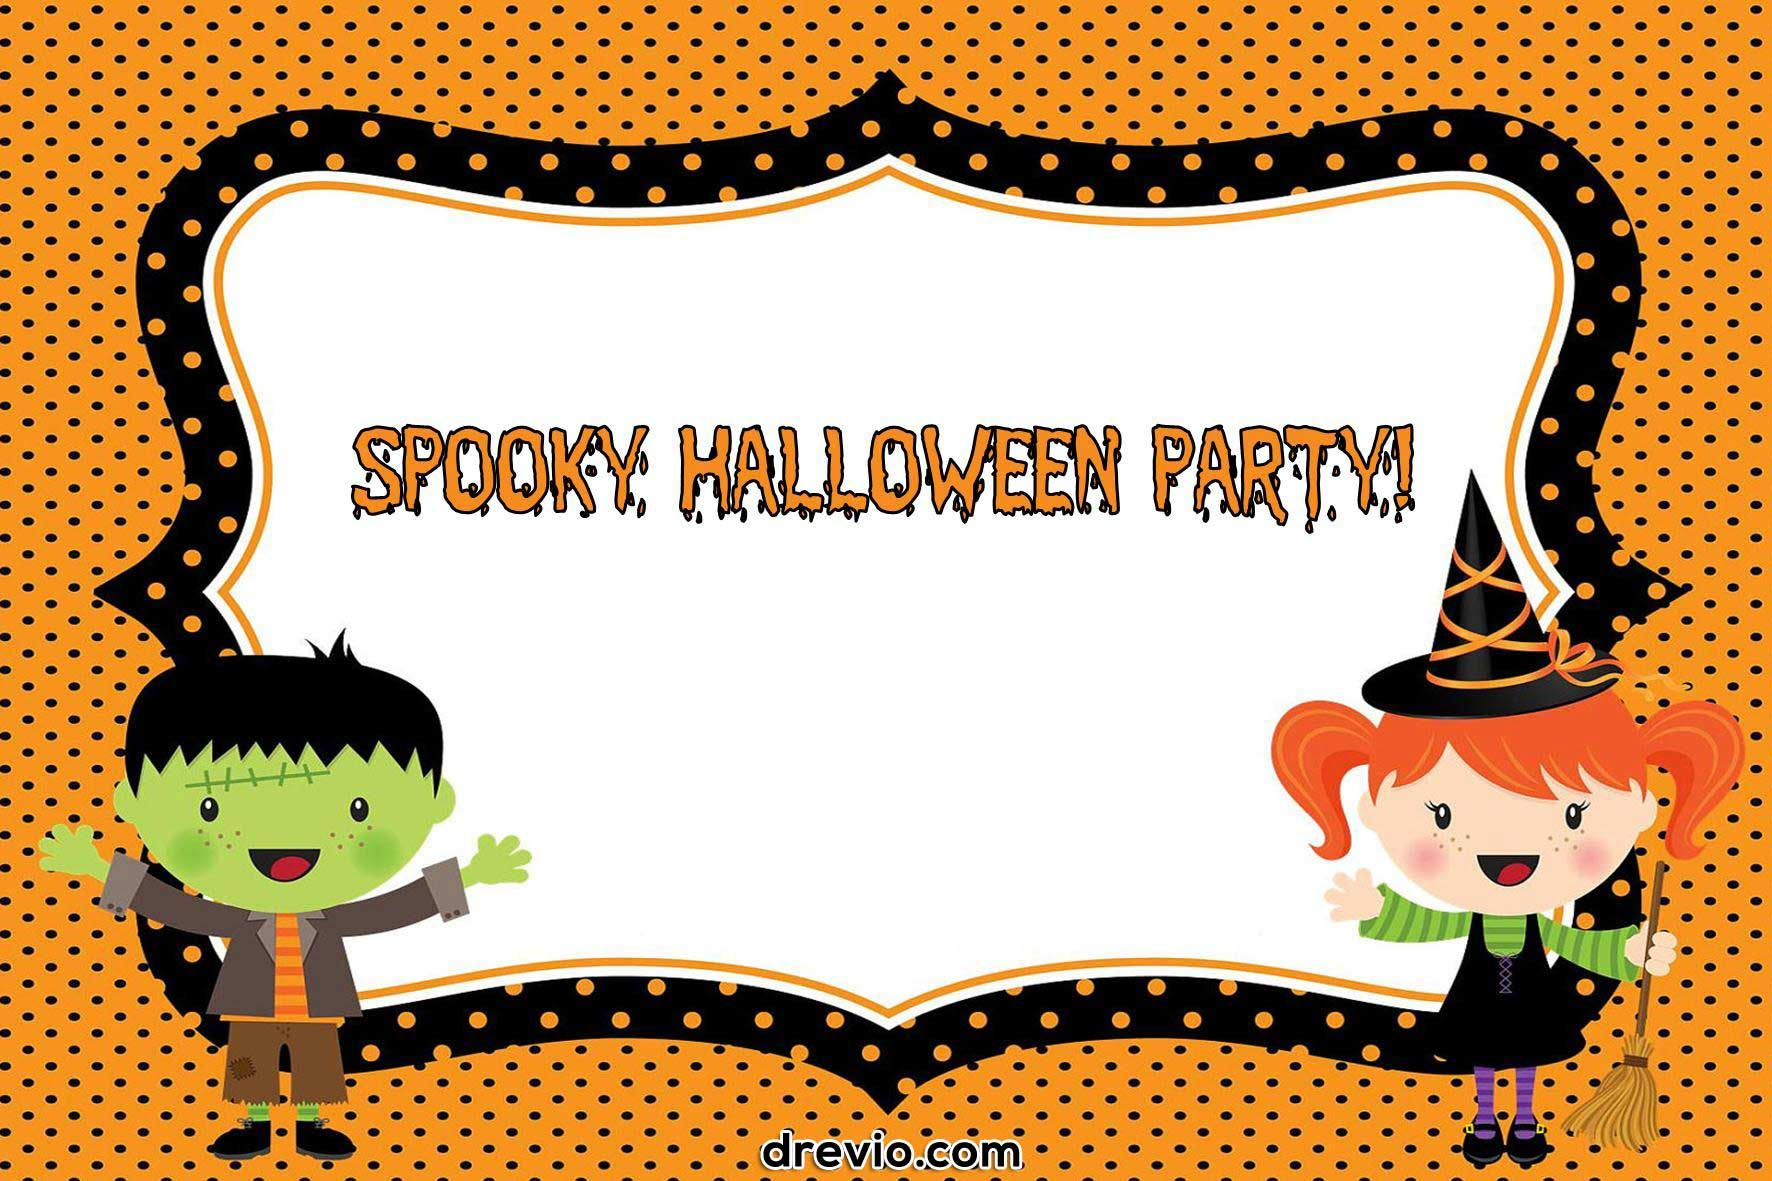 Free Printable Halloween Invitations Templates Printable Halloween Invitations Halloween Birthday Party Invitations Party Invite Template